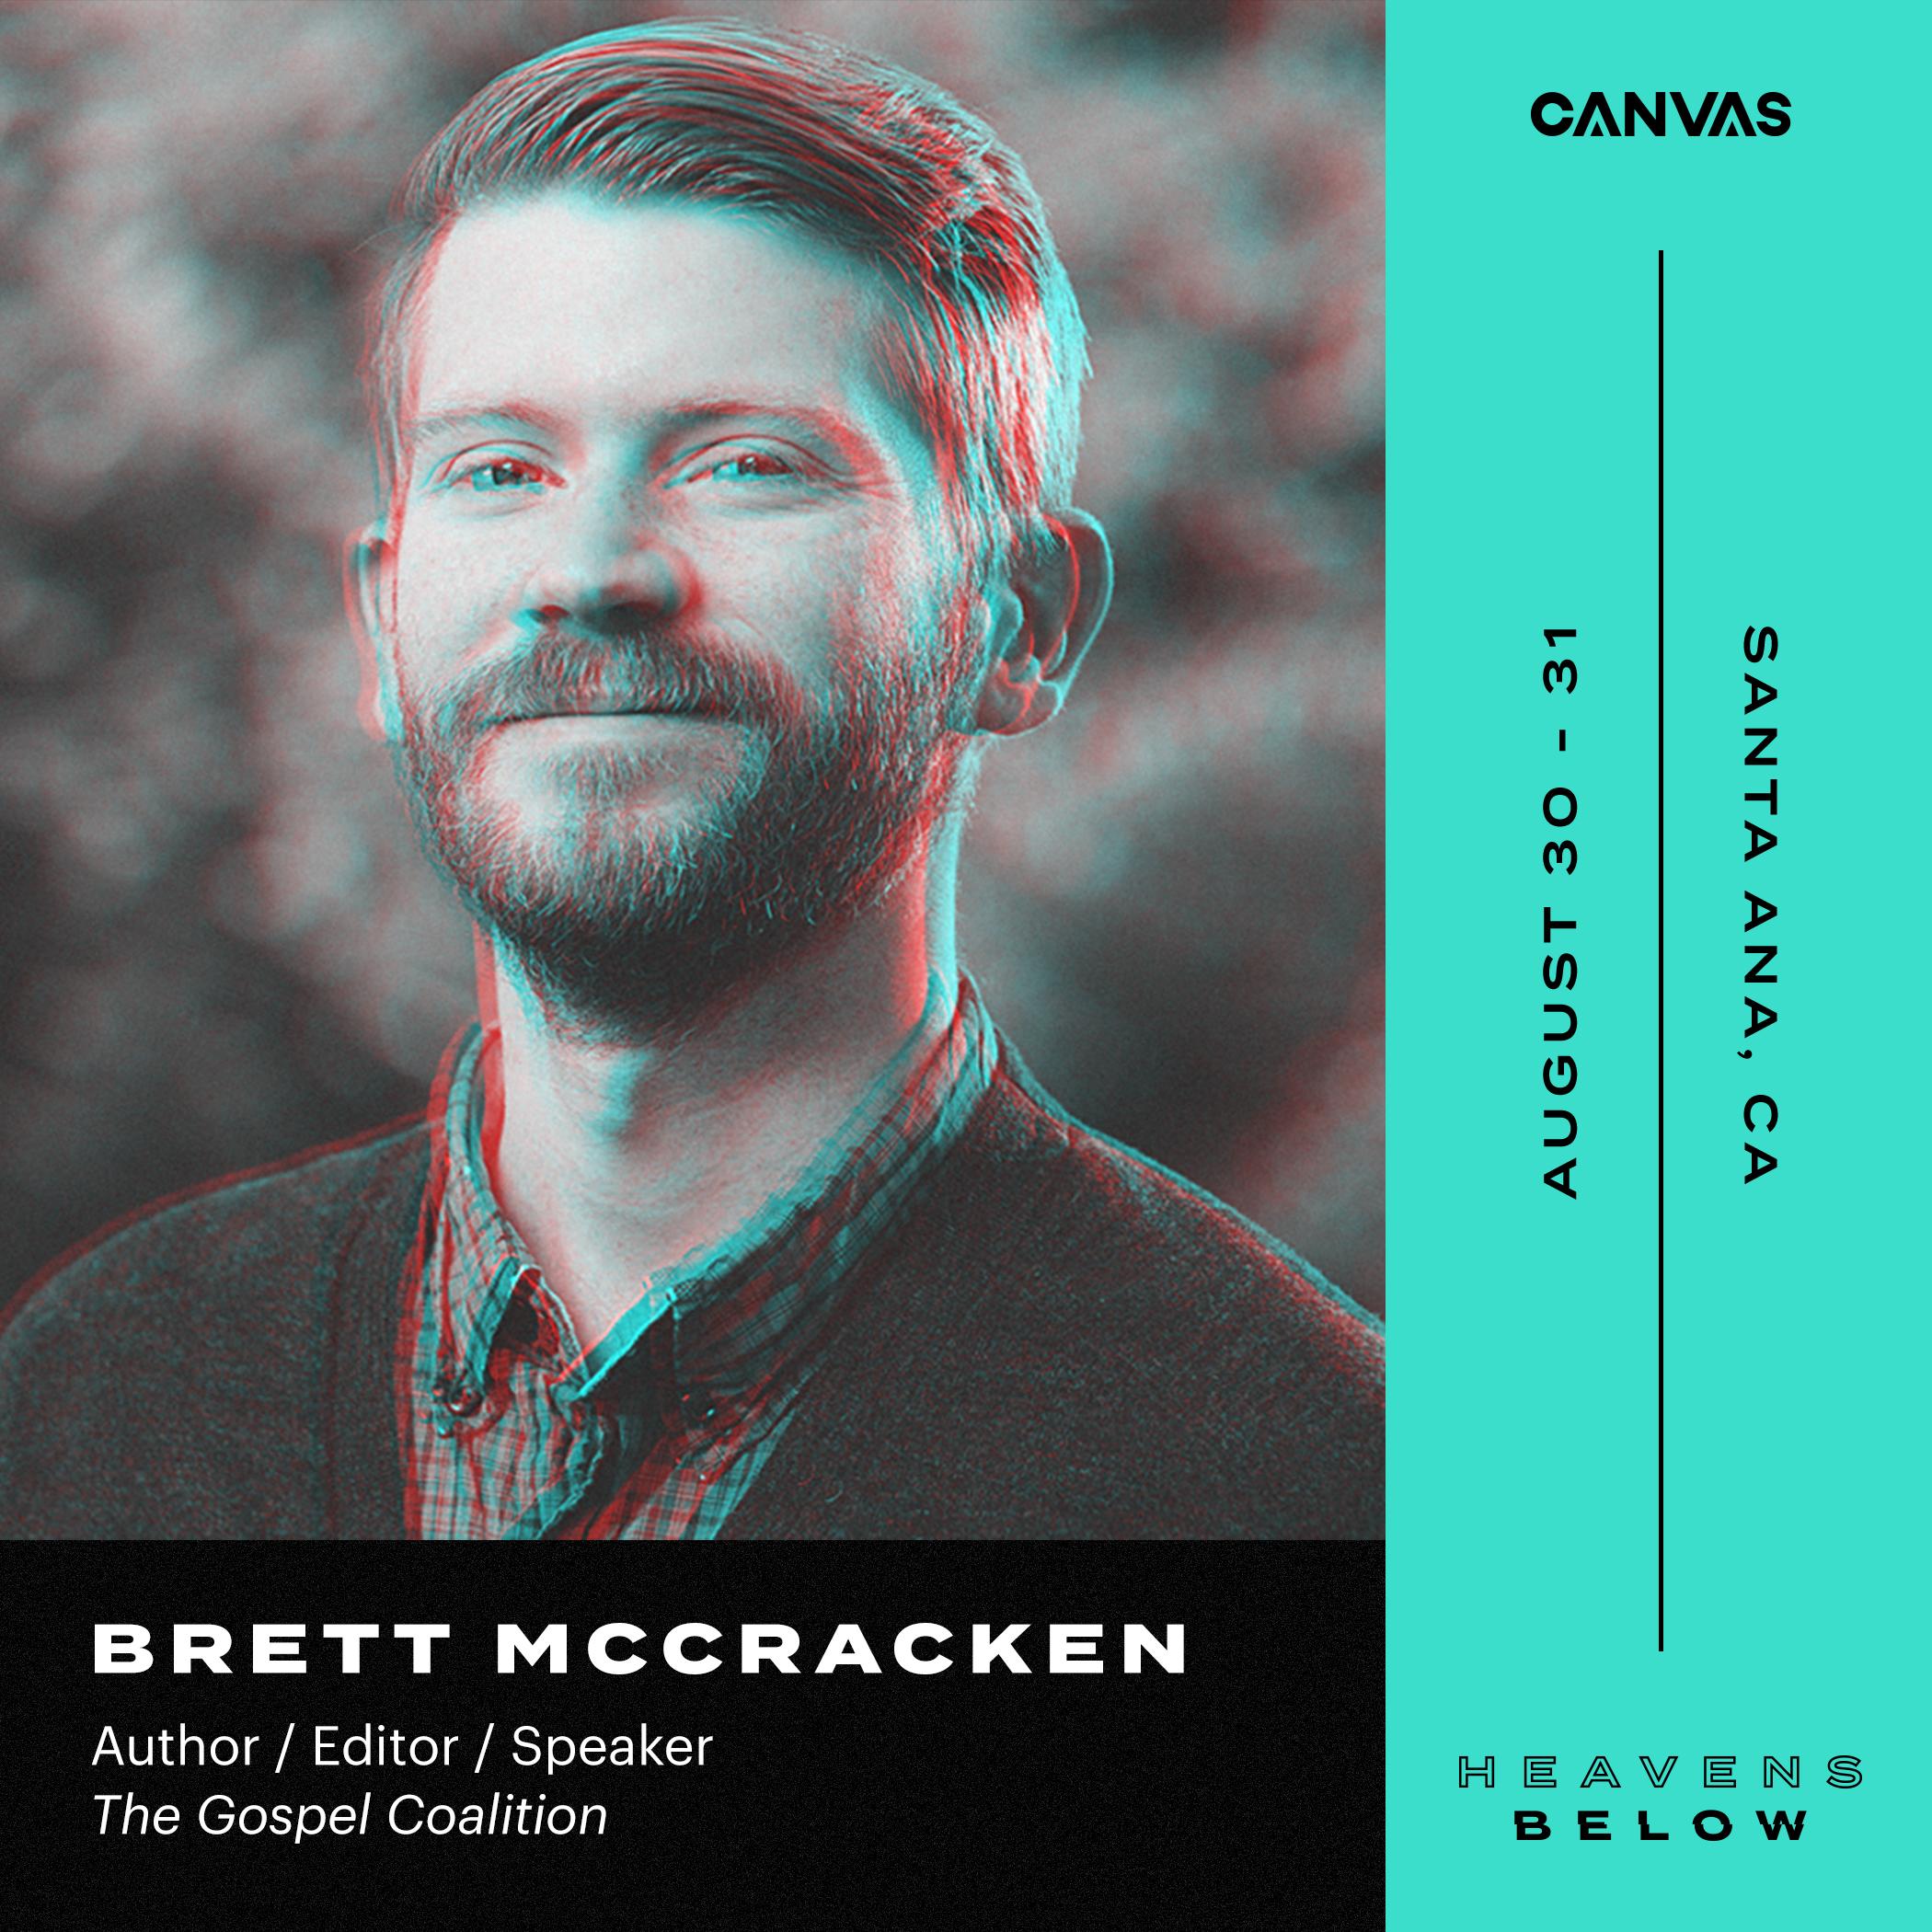 Brett-McCracken.jpg